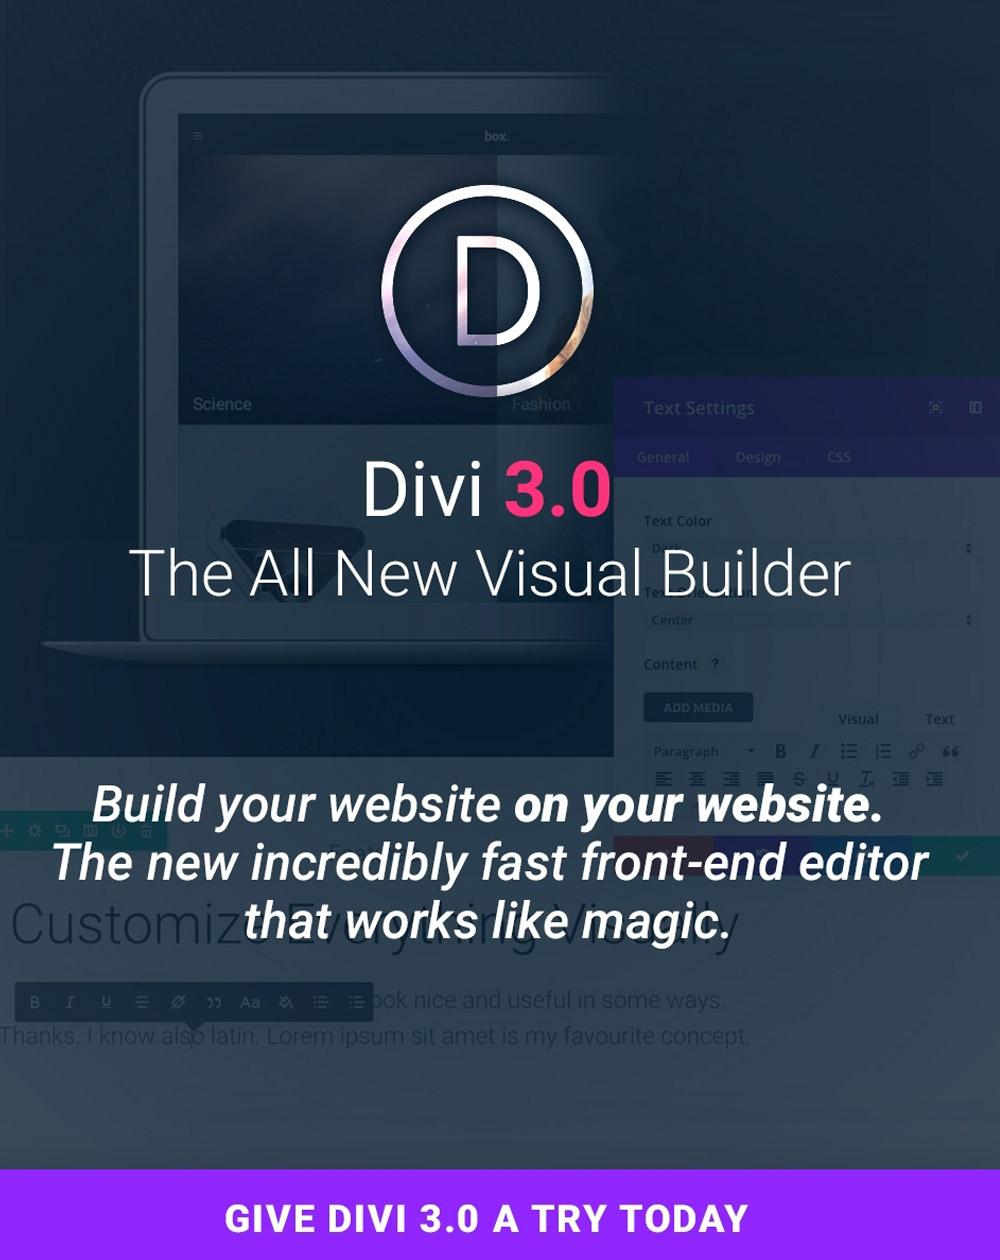 Divi theme learn how to create a website ferdy korpershoek - Divi elegant theme ...